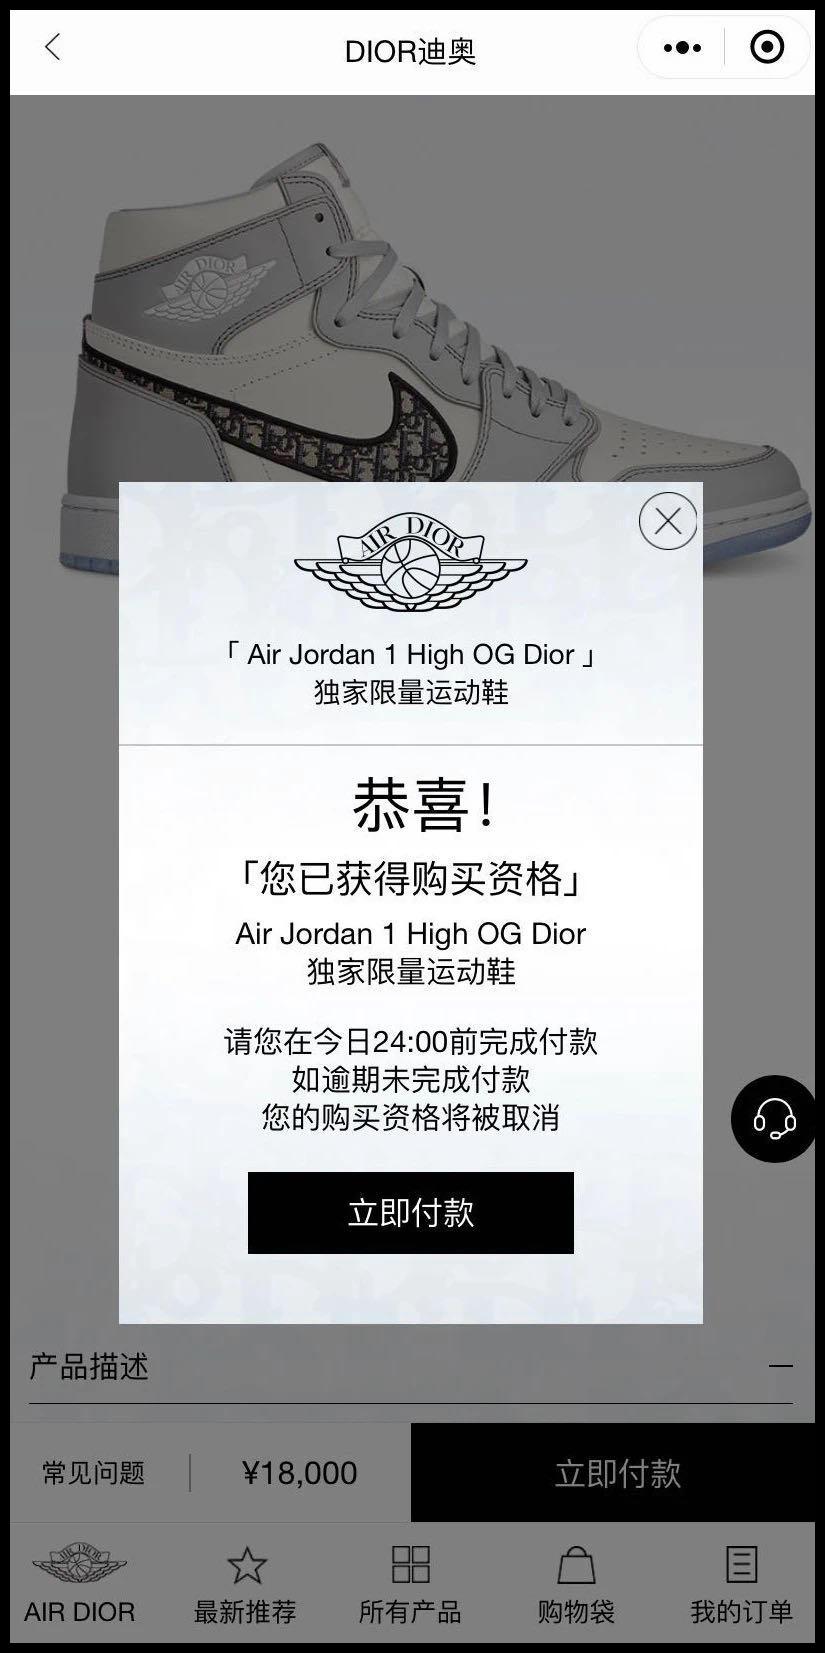 Dior,Air Jordan 1,AJ1,发售  冠希点赞!刘嘉玲晒 Dior x AJ1 上脚!顶级 VIP 才有这待遇!